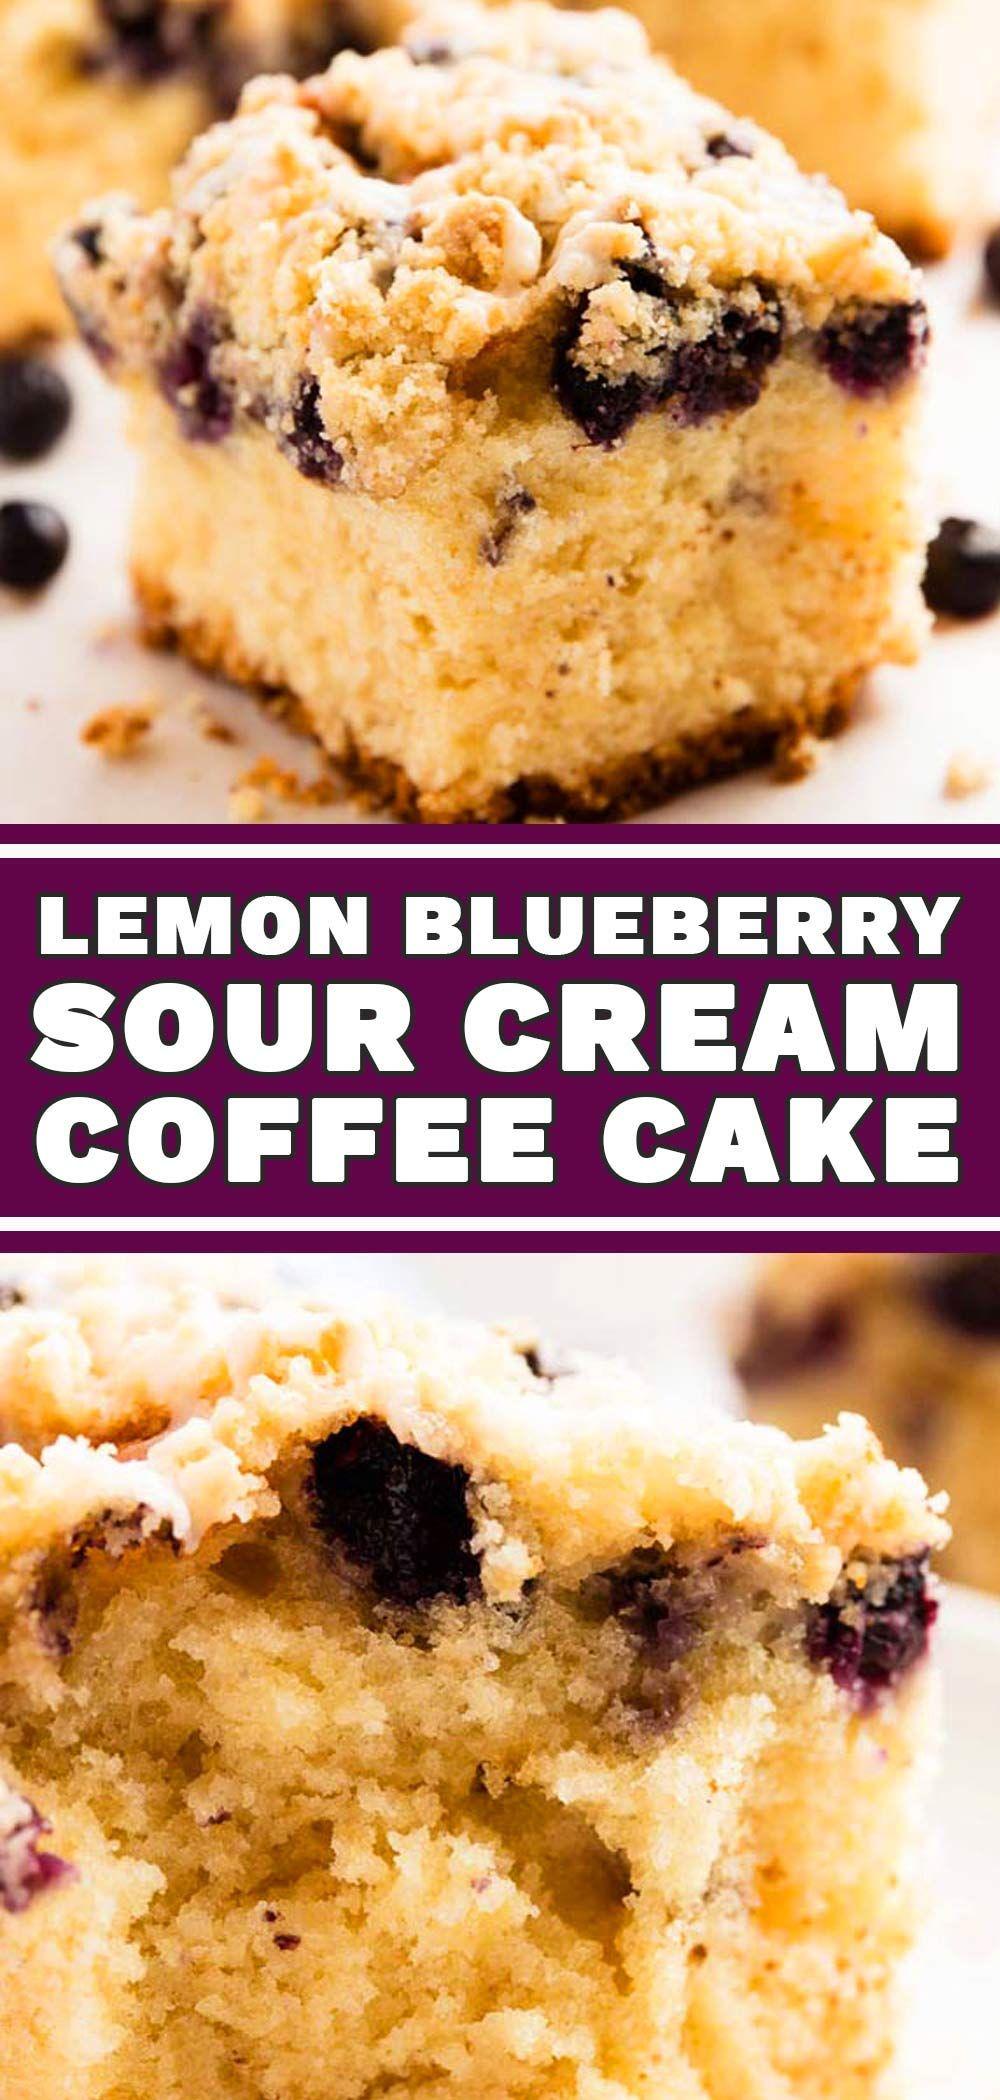 Blueberry Lemon Coffee Cake made with cake mix! You won't